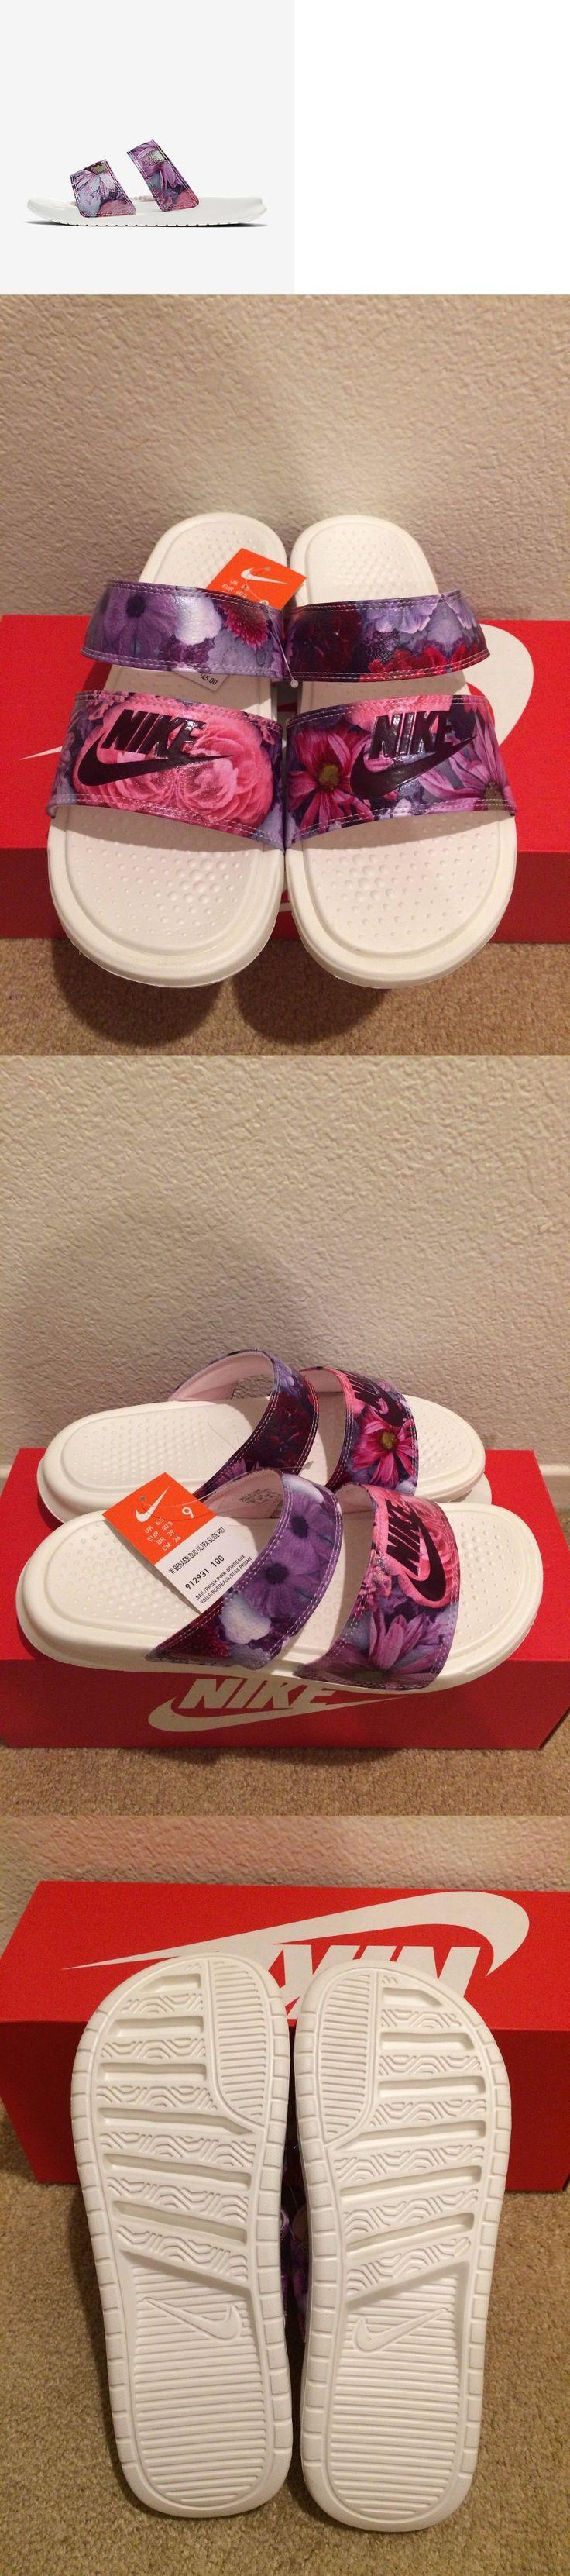 Sandals and Flip Flops 62107: Ds Women S Size 9 Nike Benassi Duo Ultra Premium Slide 912931-100 Slides Sandals -> BUY IT NOW ONLY: $54.99 on eBay!